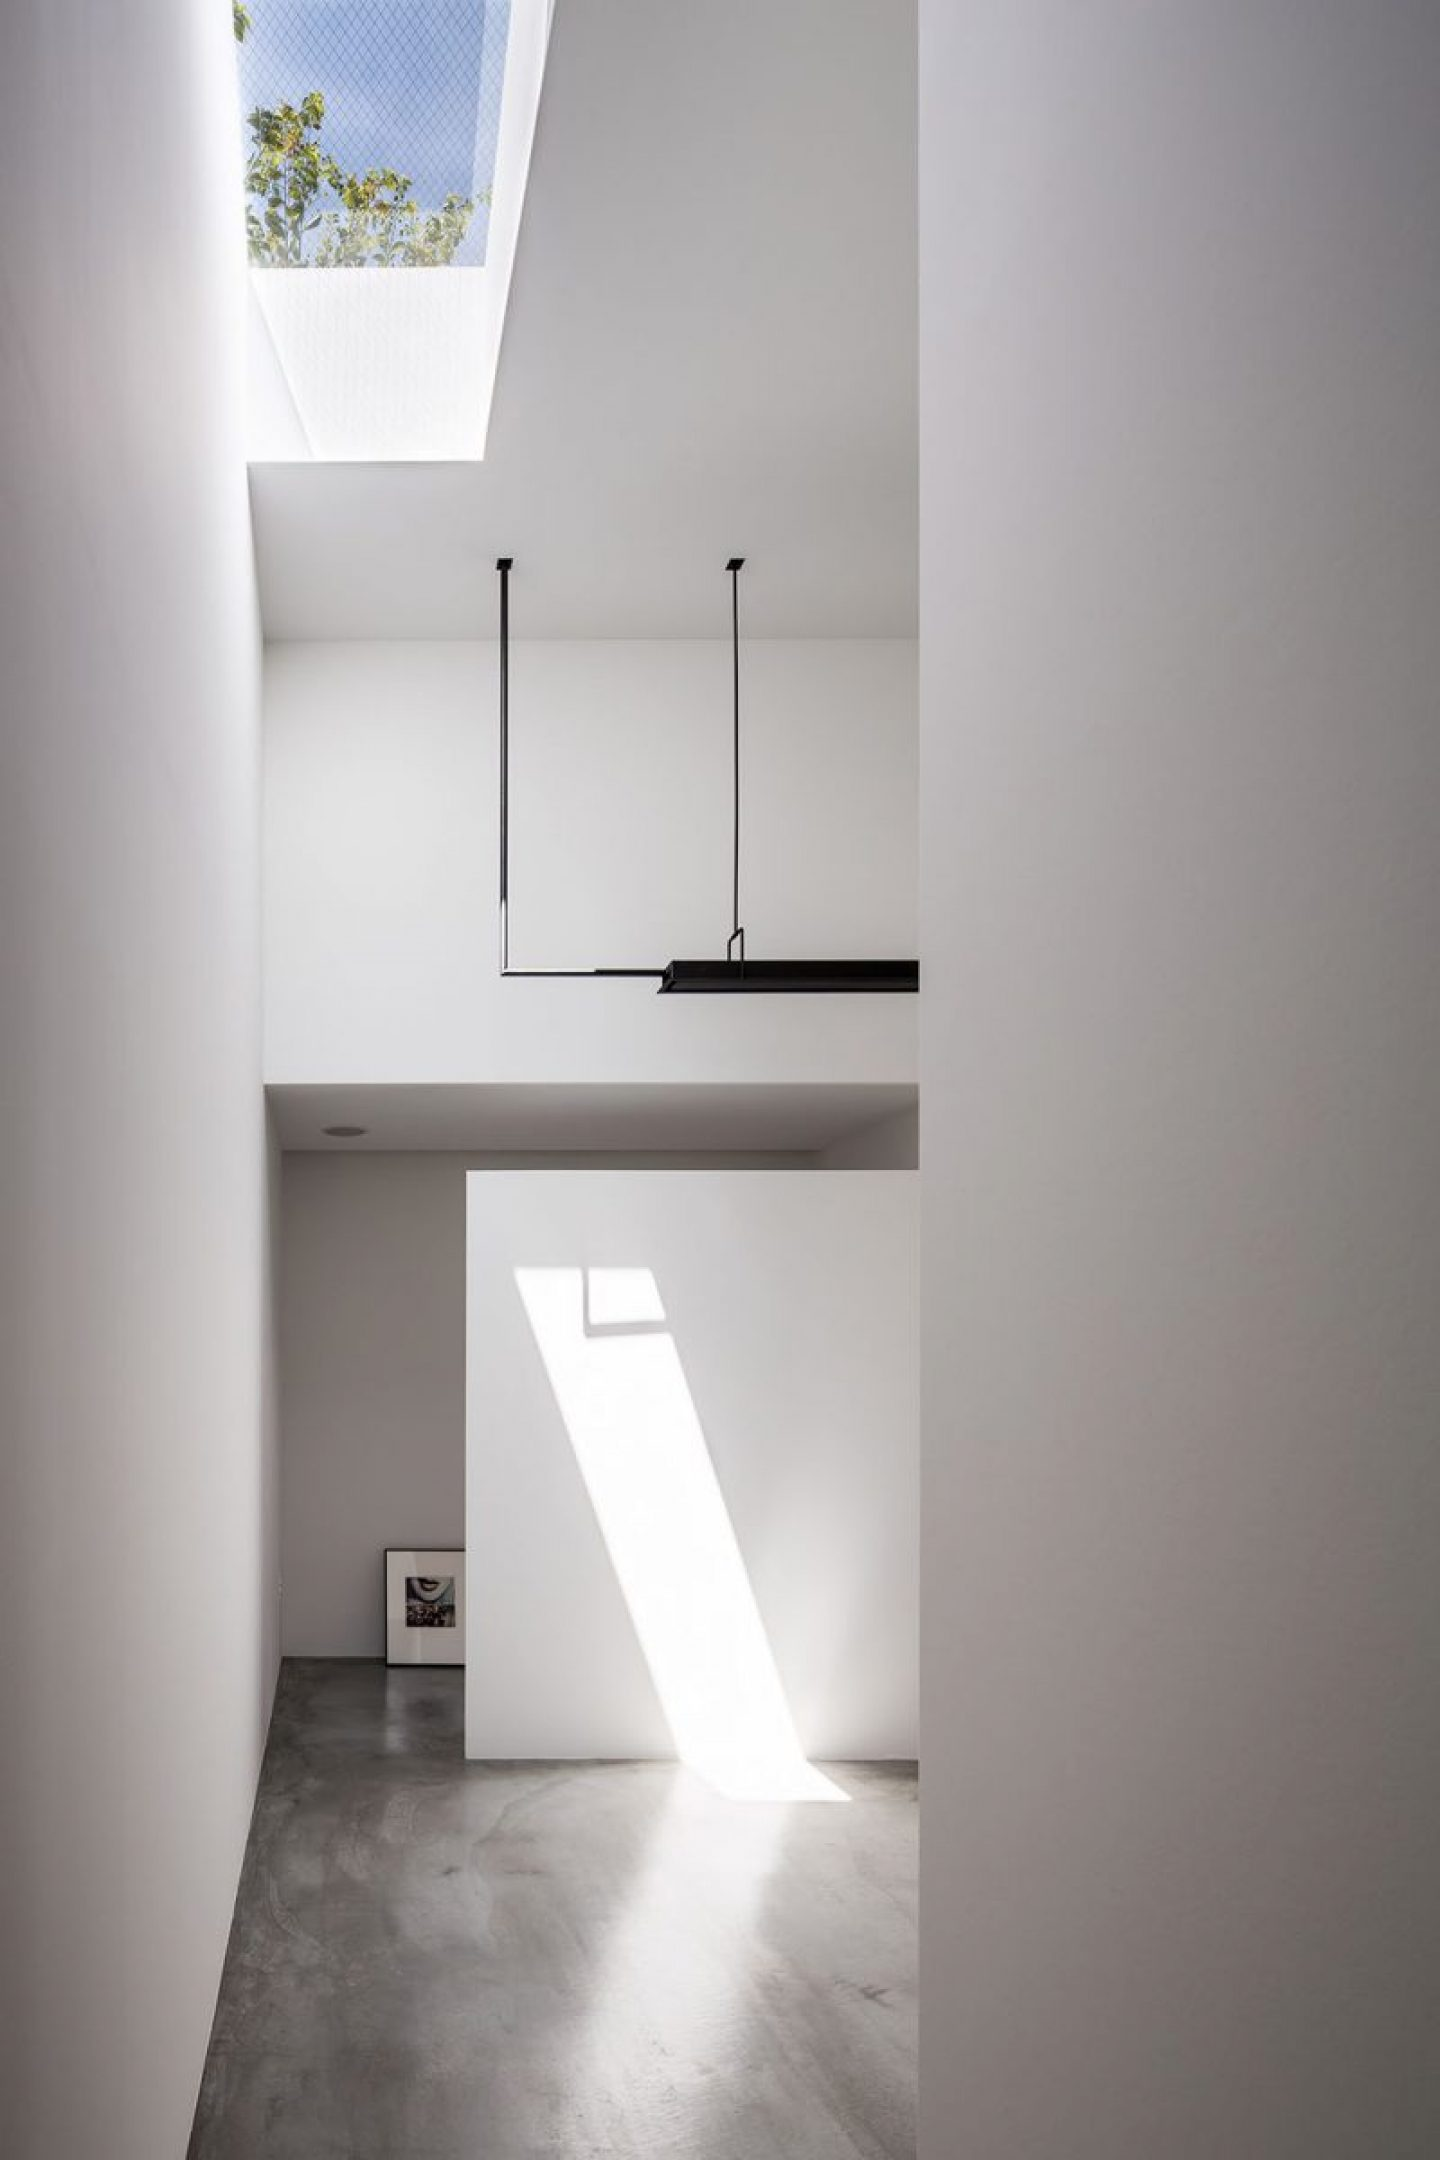 iGNANT_Architecture_House_For_A_Photographer_FORM_Kouichi_Kimura_Architects_14